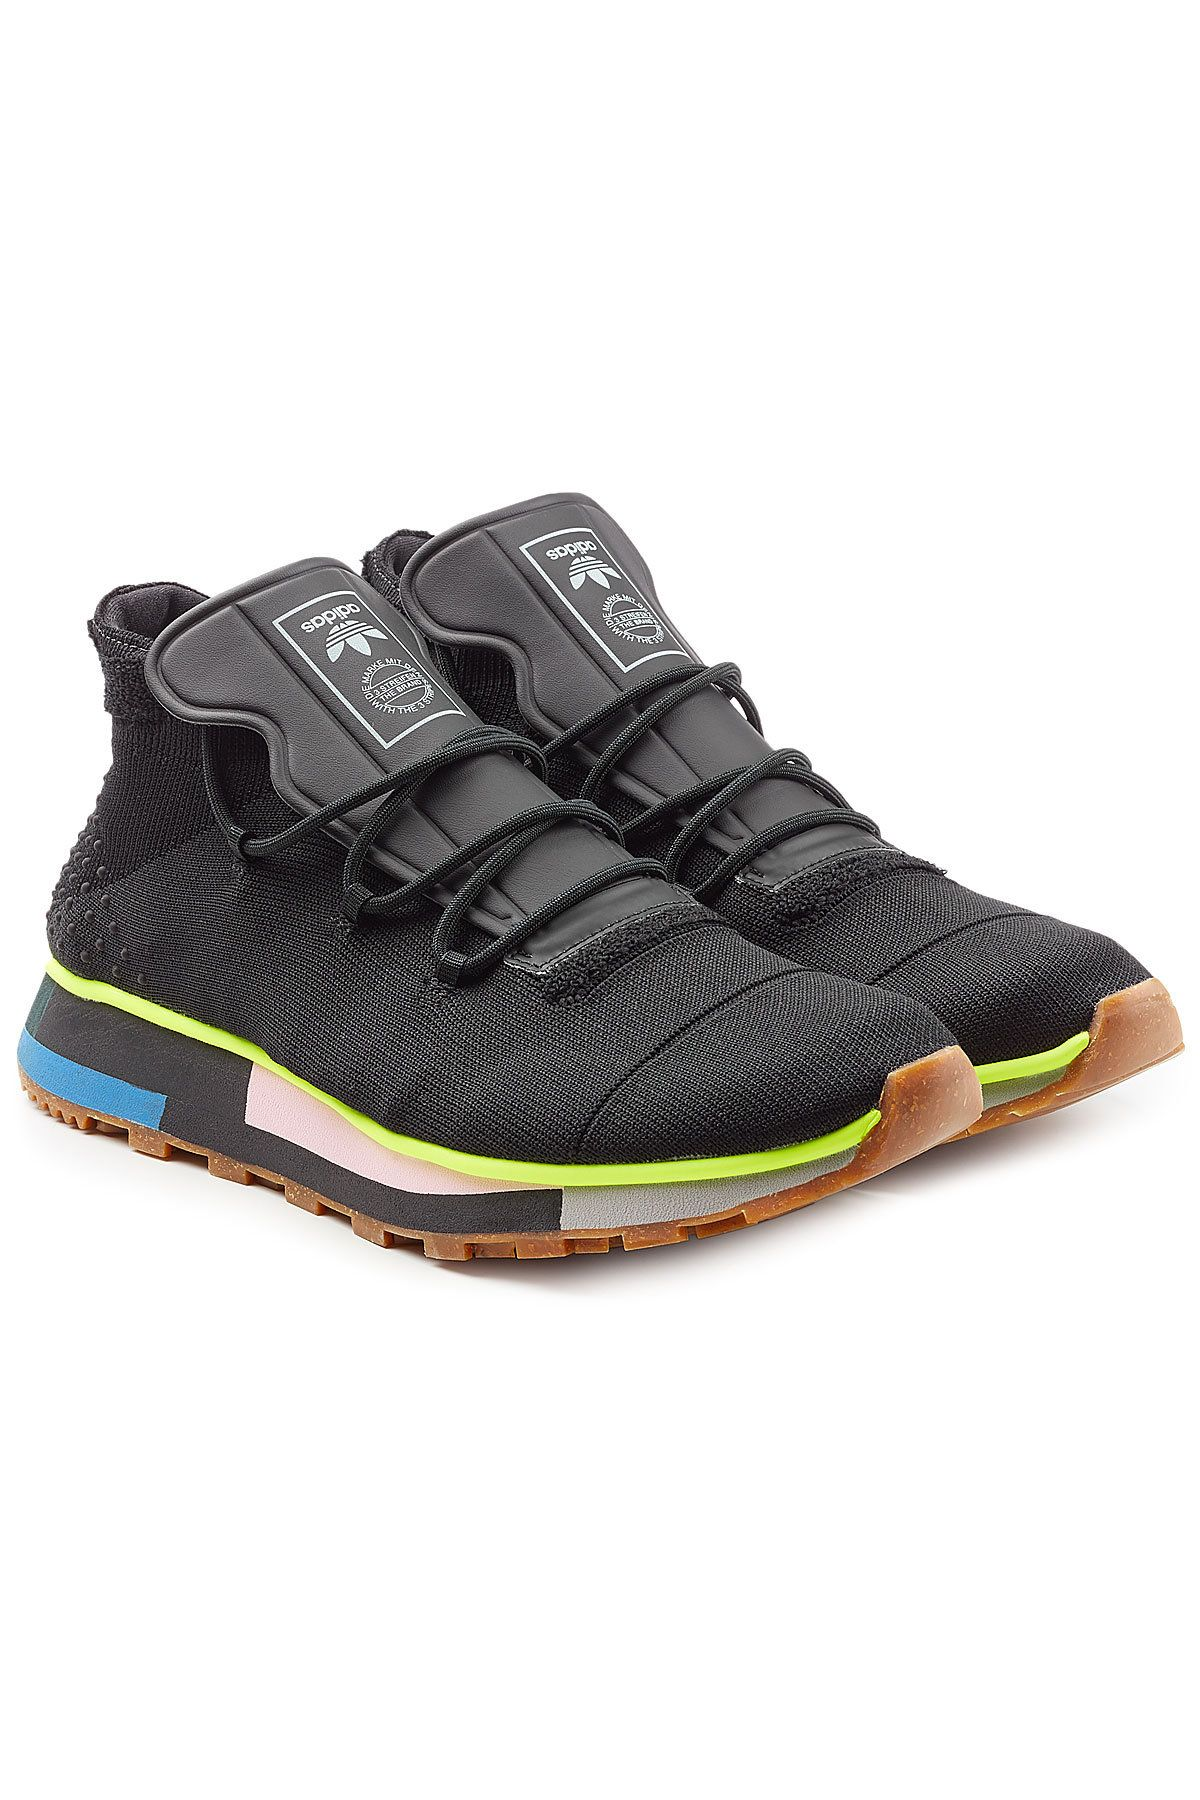 detailed look 0eead 383f2 ADIDAS ORIGINALS BY ALEXANDER WANG RUN SNEAKERS WITH MESH.   adidasoriginalsbyalexanderwang  shoes